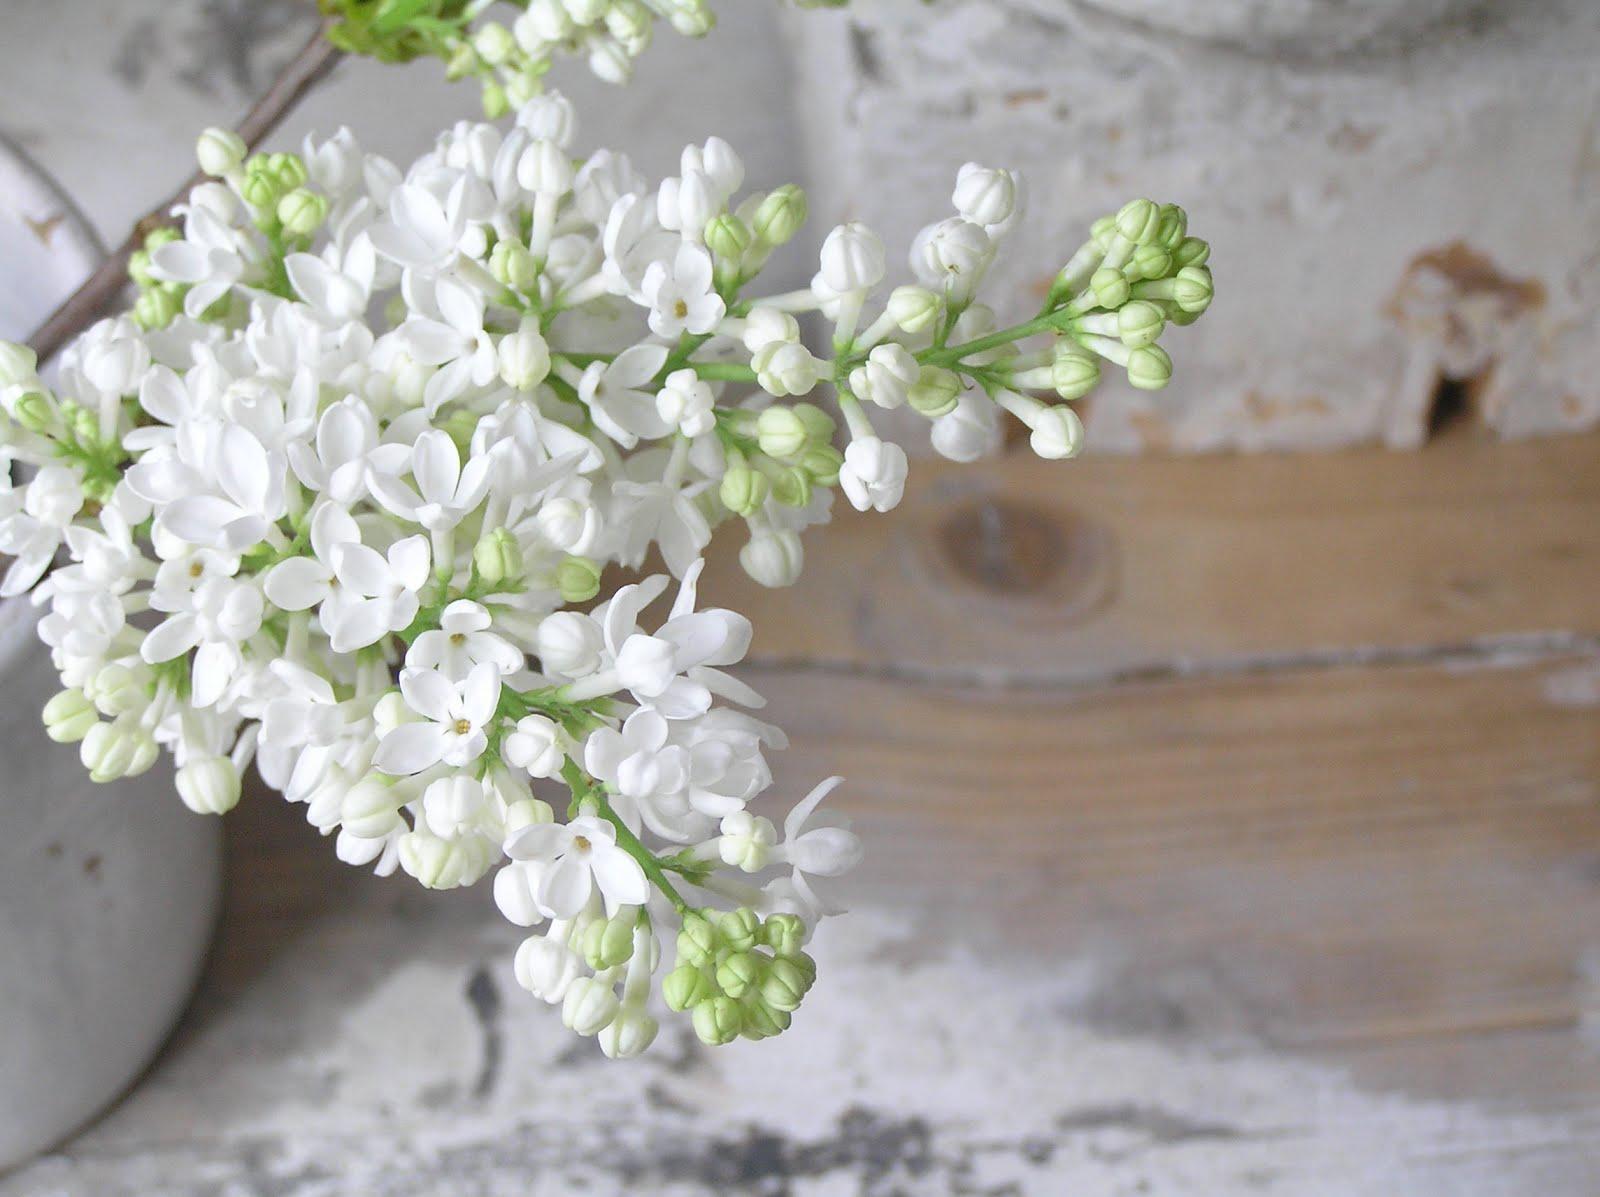 Pastels and Whites Seringen en oude stoelen Flowers and